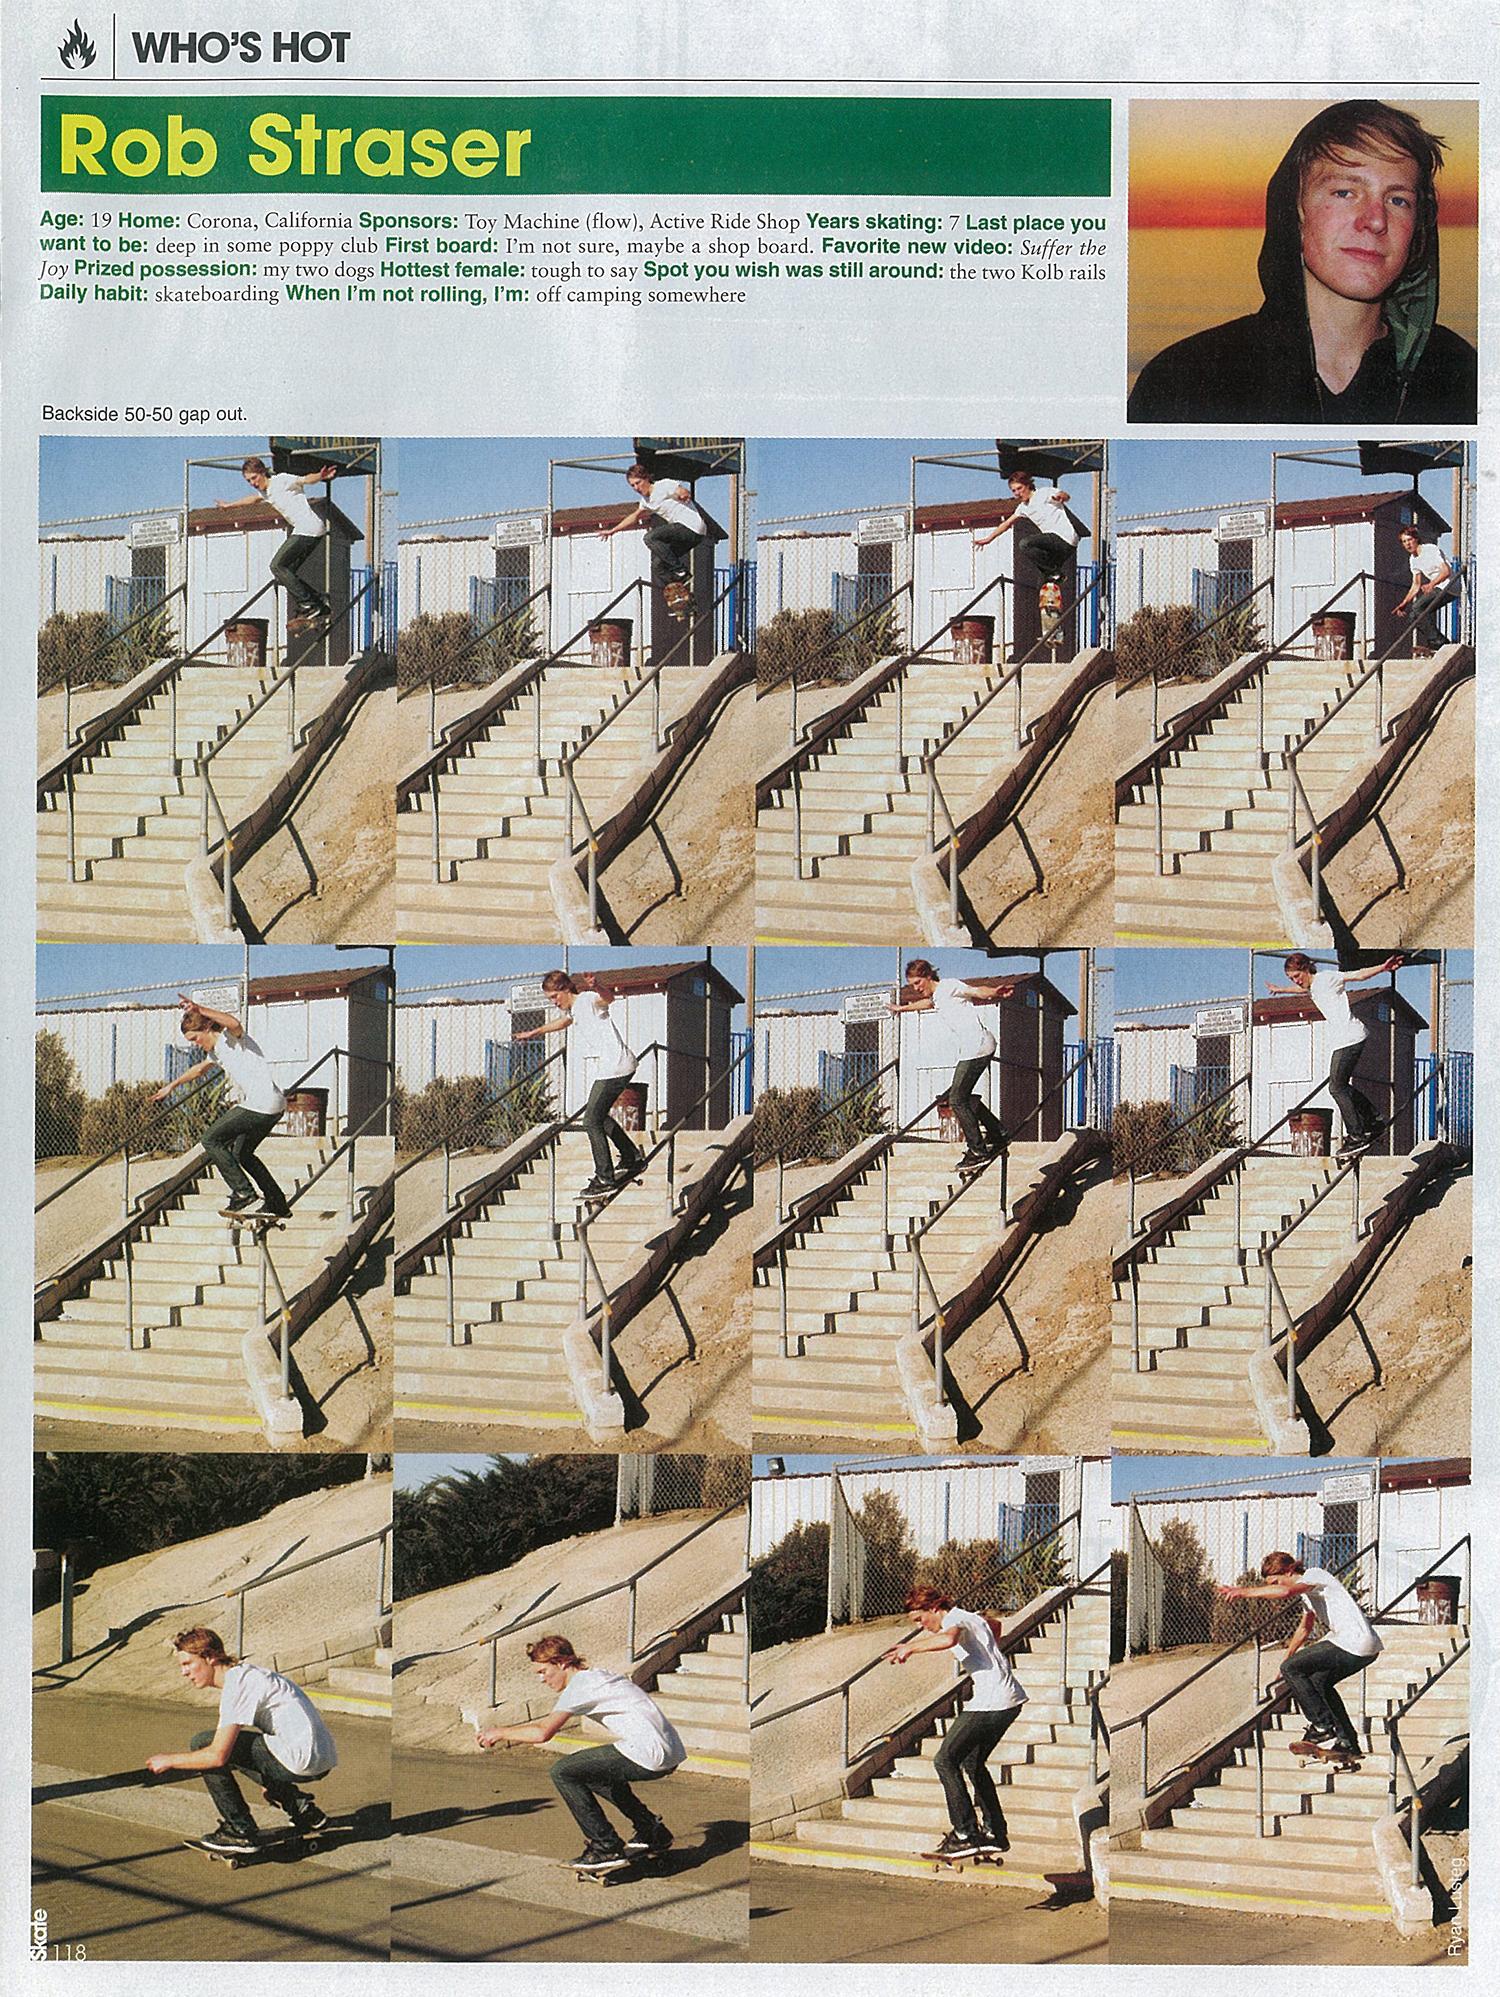 17_rob_straser_whos_hot_skateboarder.jpg